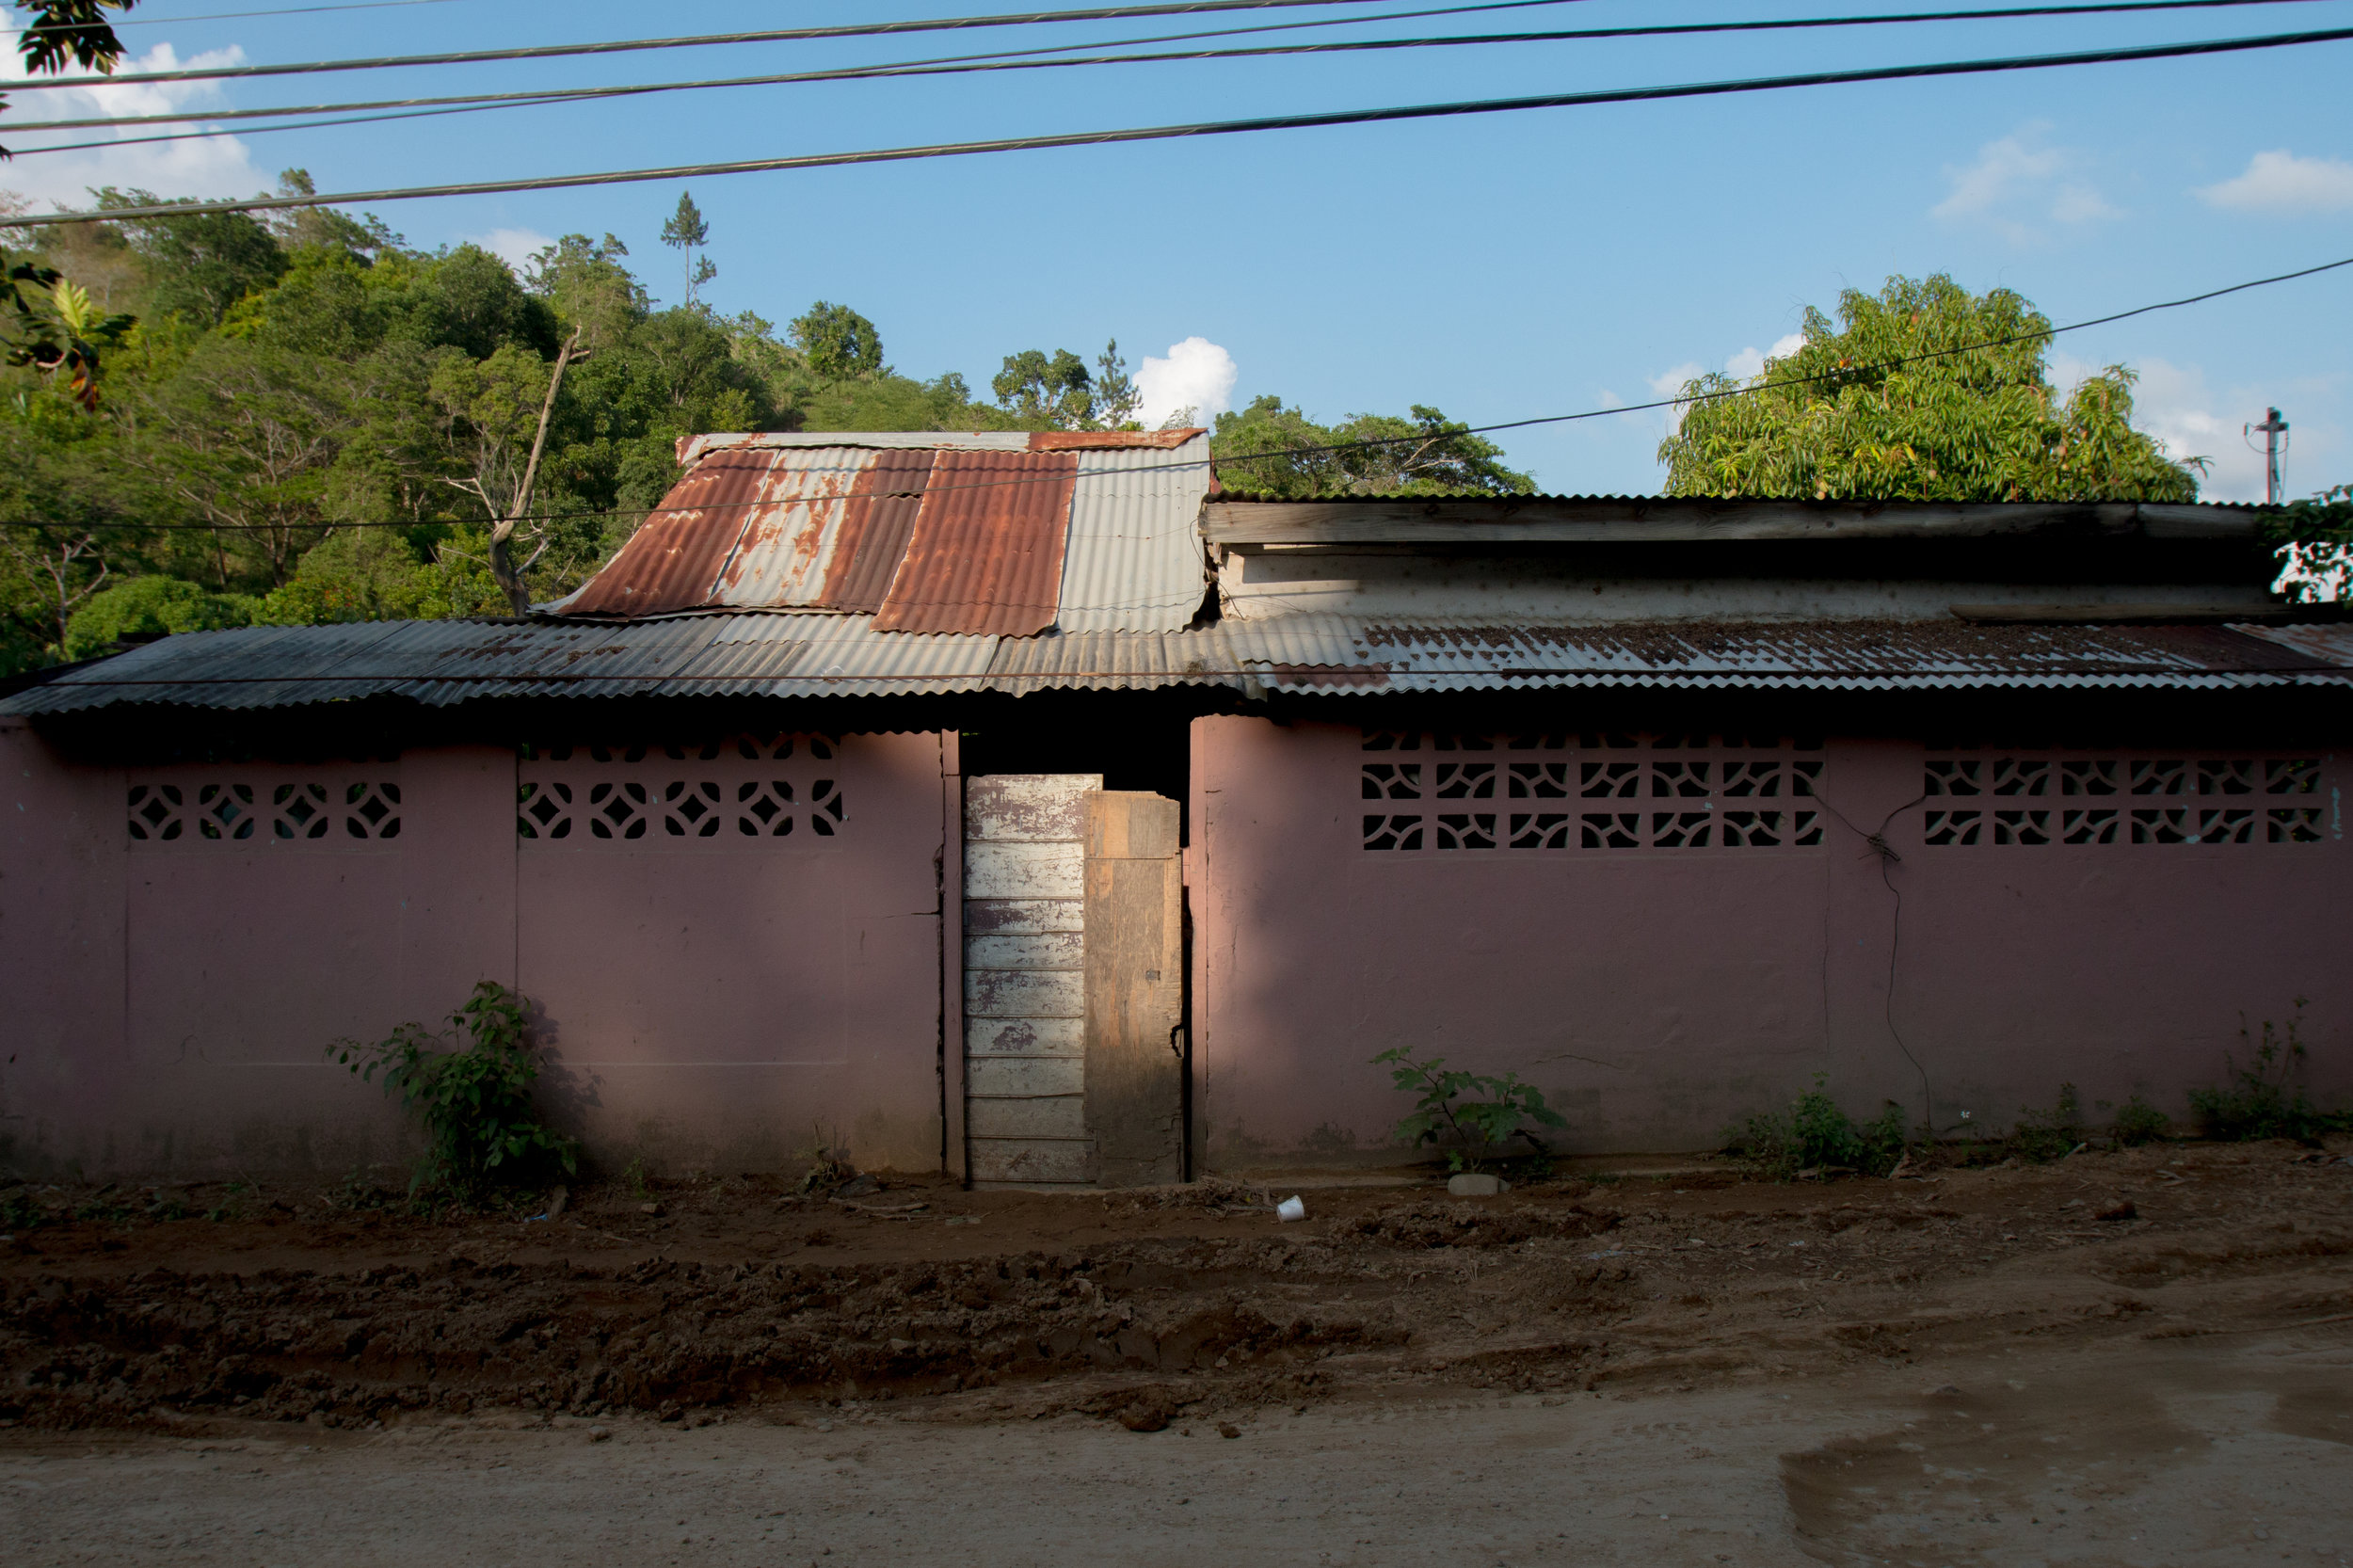 Jamaica edits for blog-28.jpg